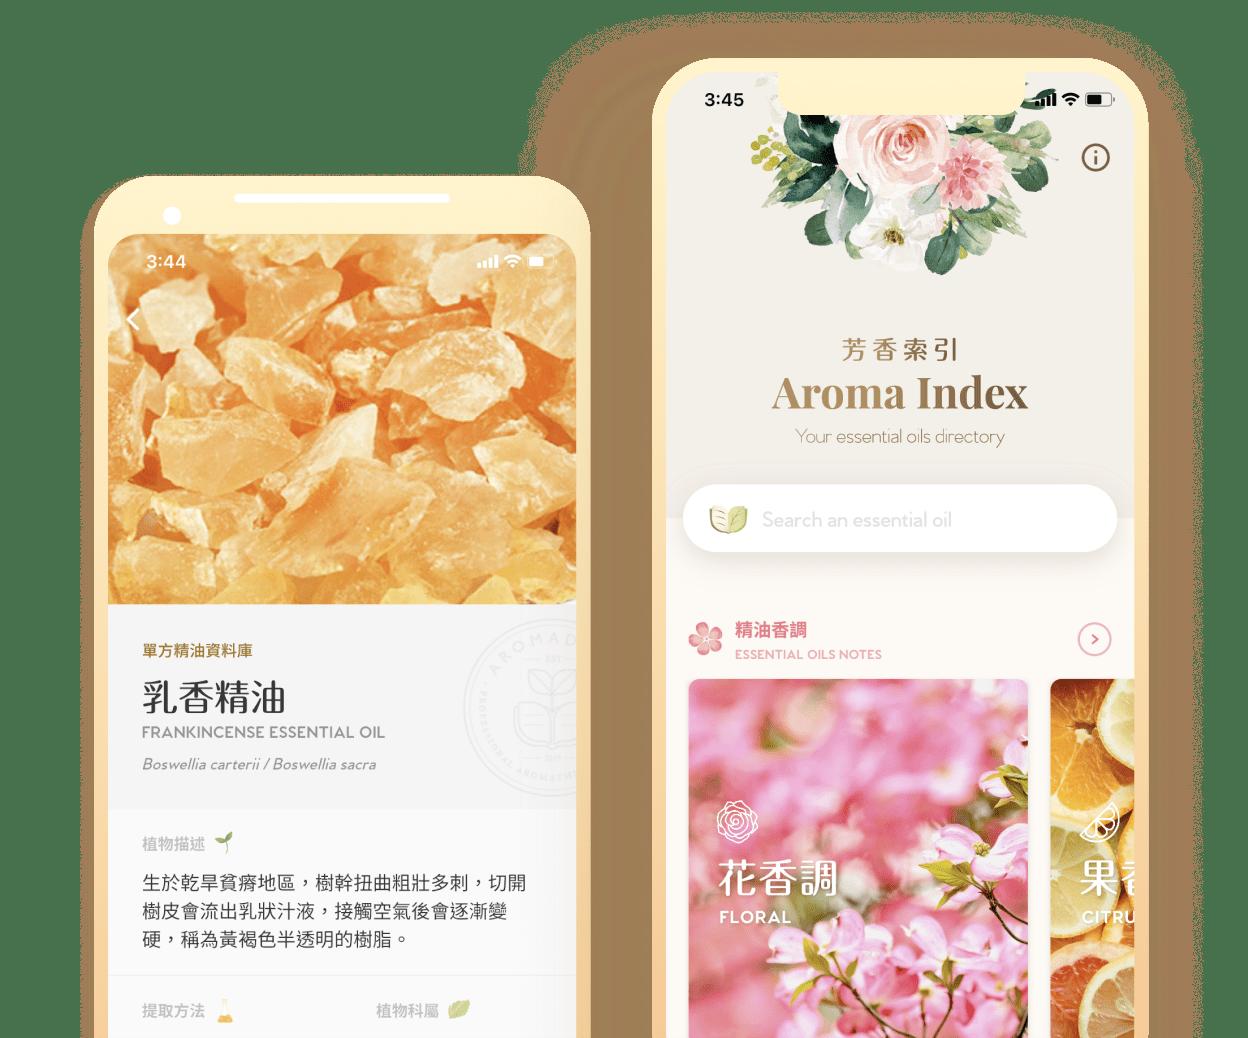 Aroma Index